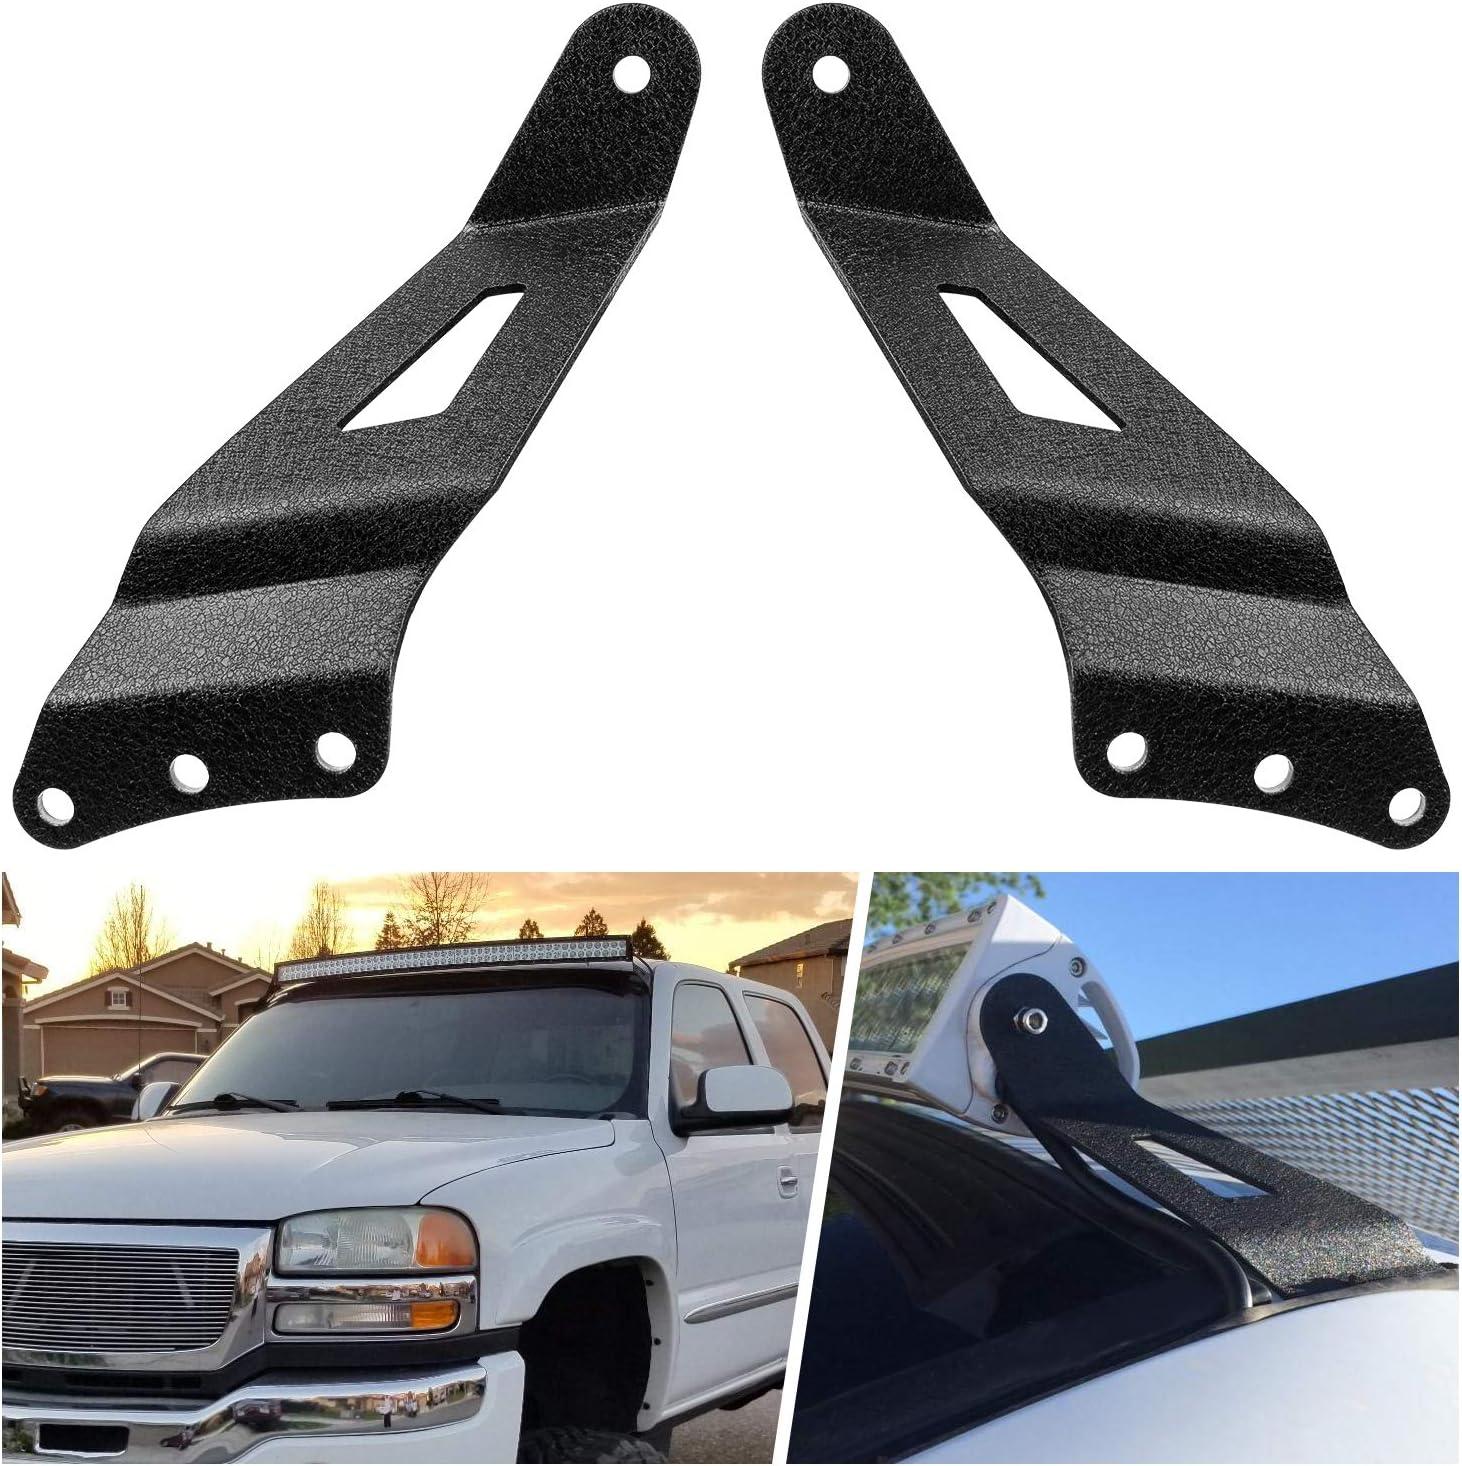 6 inch Driver side WITH install kit -Black LED 2000 Chevrolet C1500-C3500 PICK UP Door mount spotlight